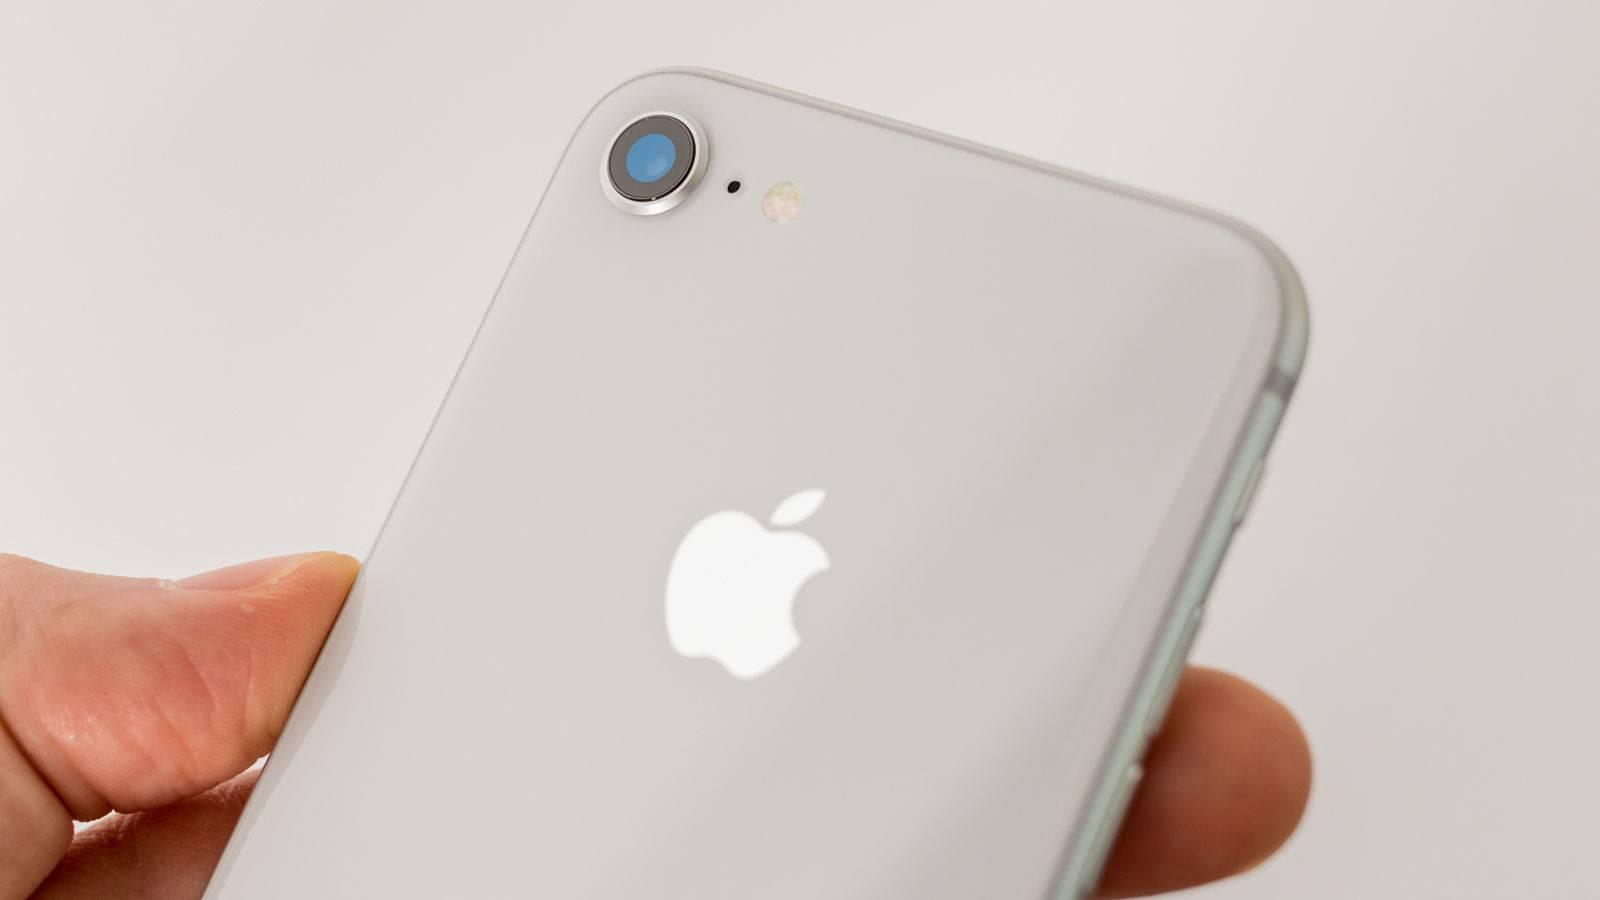 iPhone SE 2 surpriza nimeni gandit